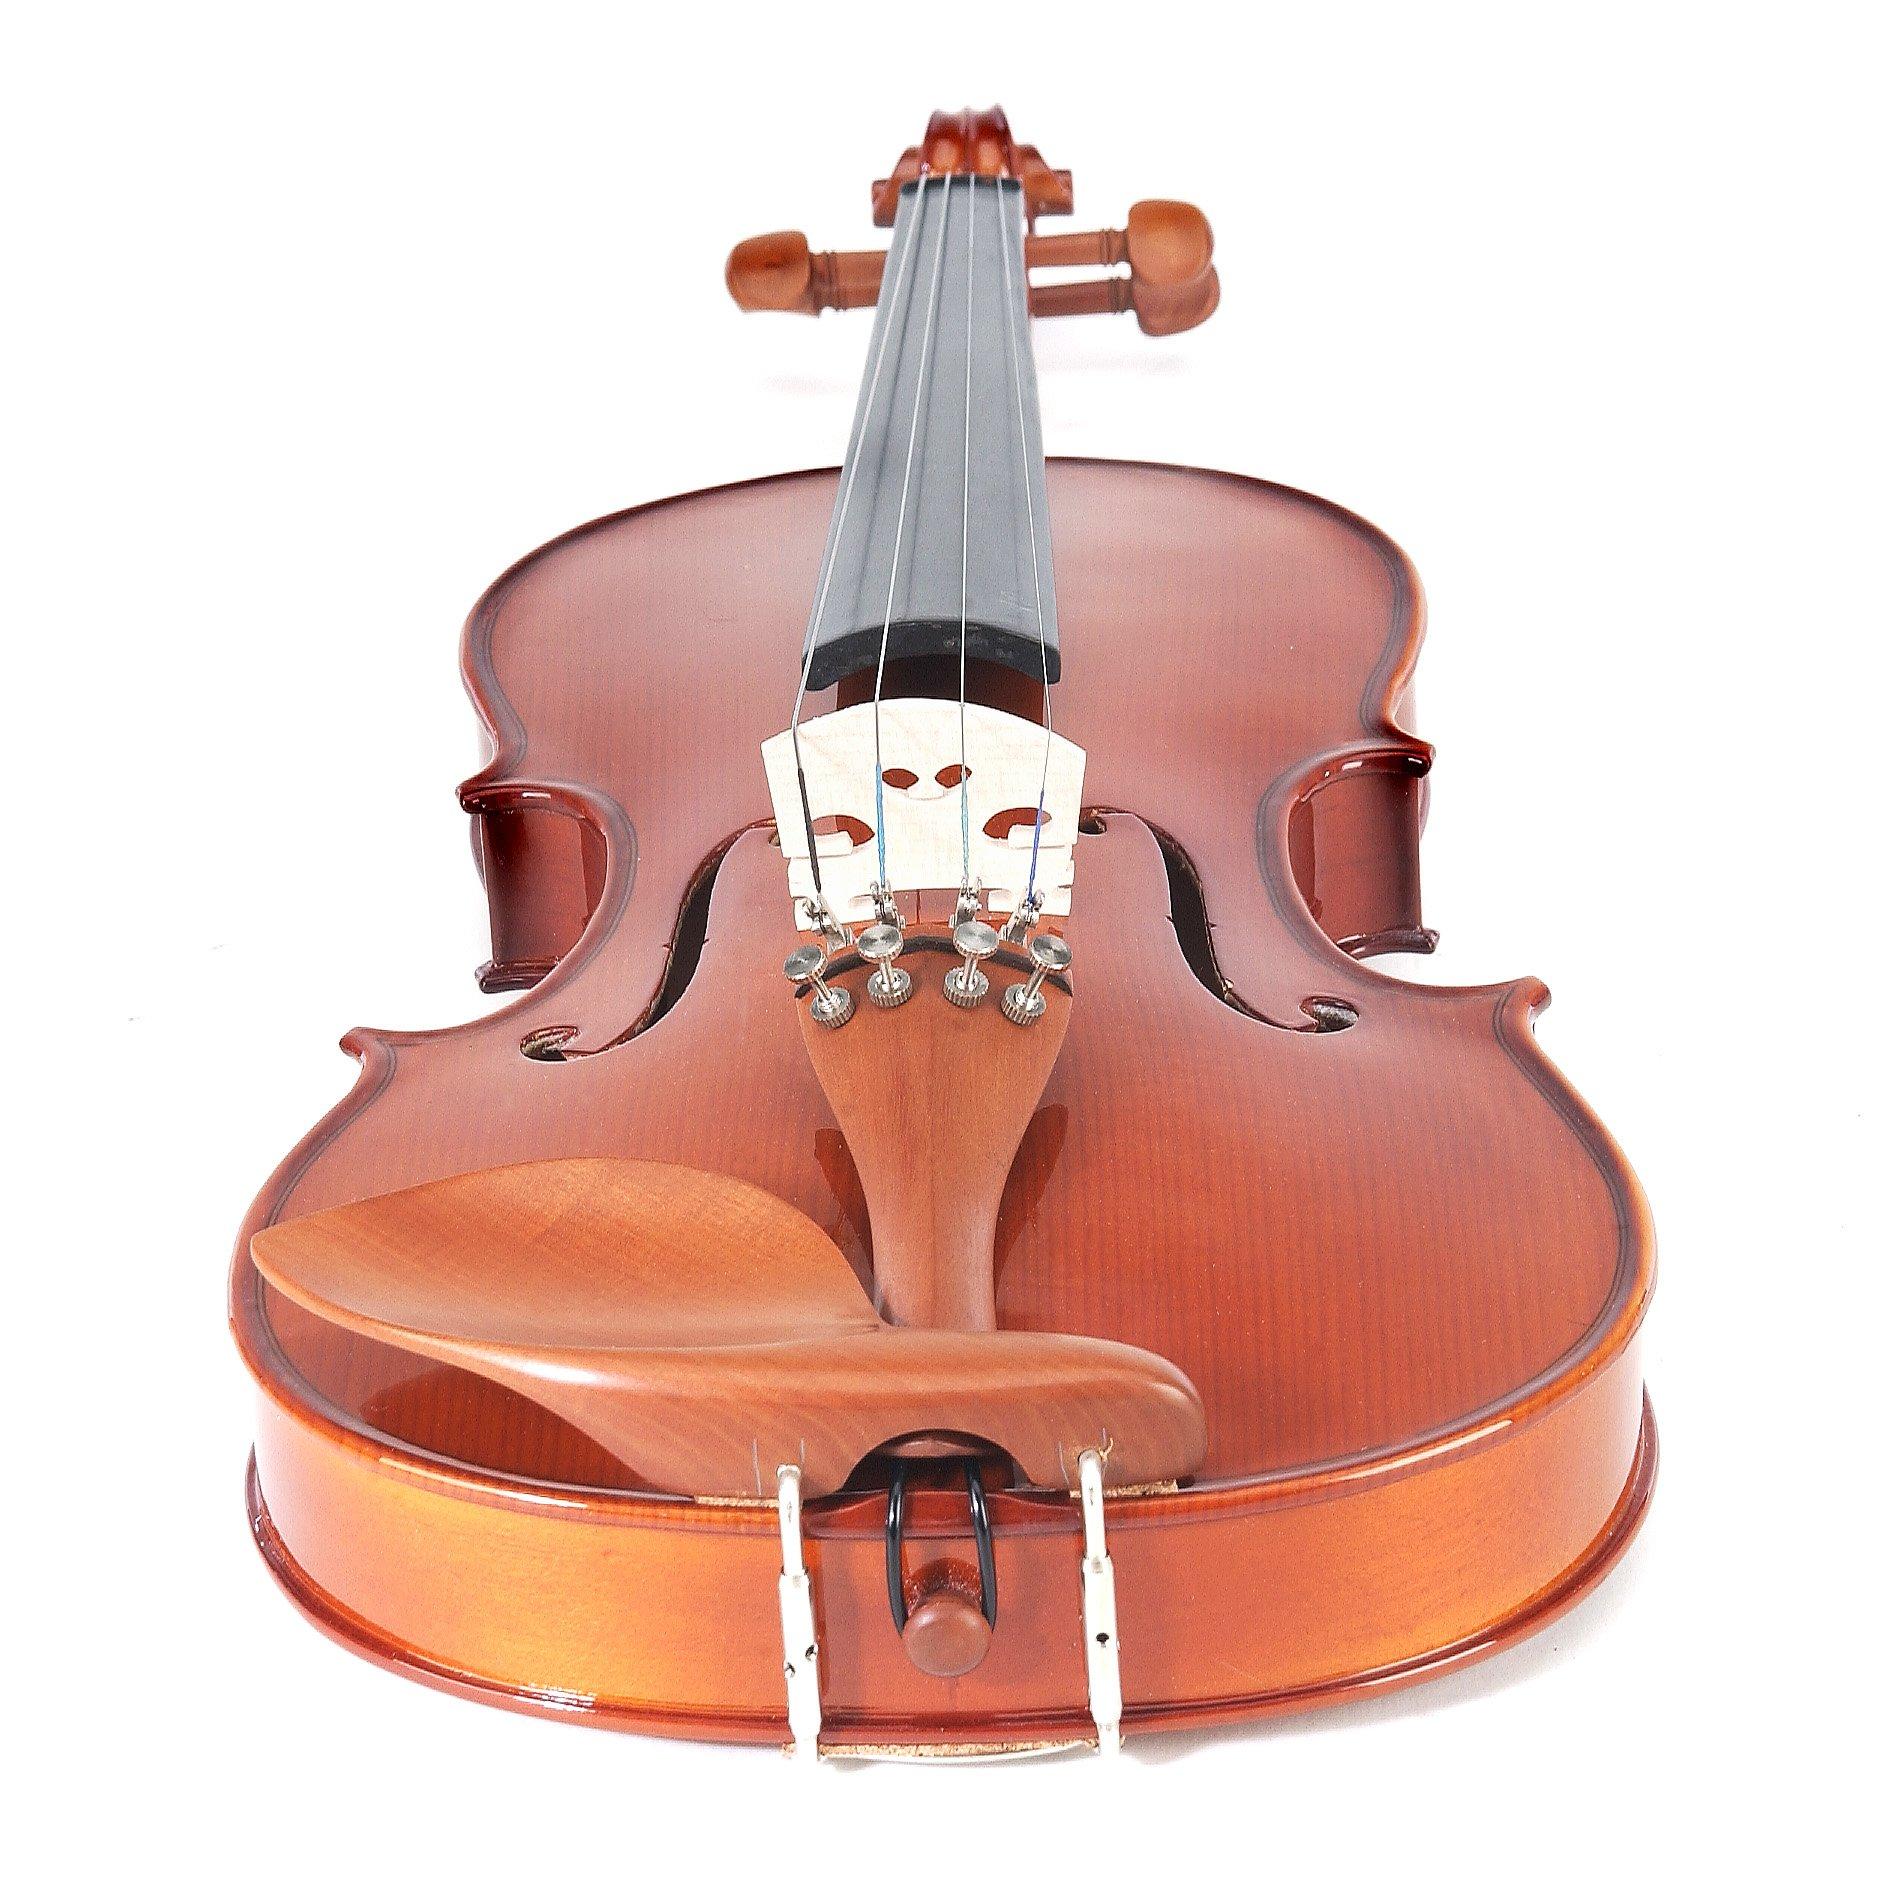 Cecilio CVN-200 Solidwood Violin with D'Addario Prelude Strings, Size 4/4 (Full Size) by Cecilio (Image #4)